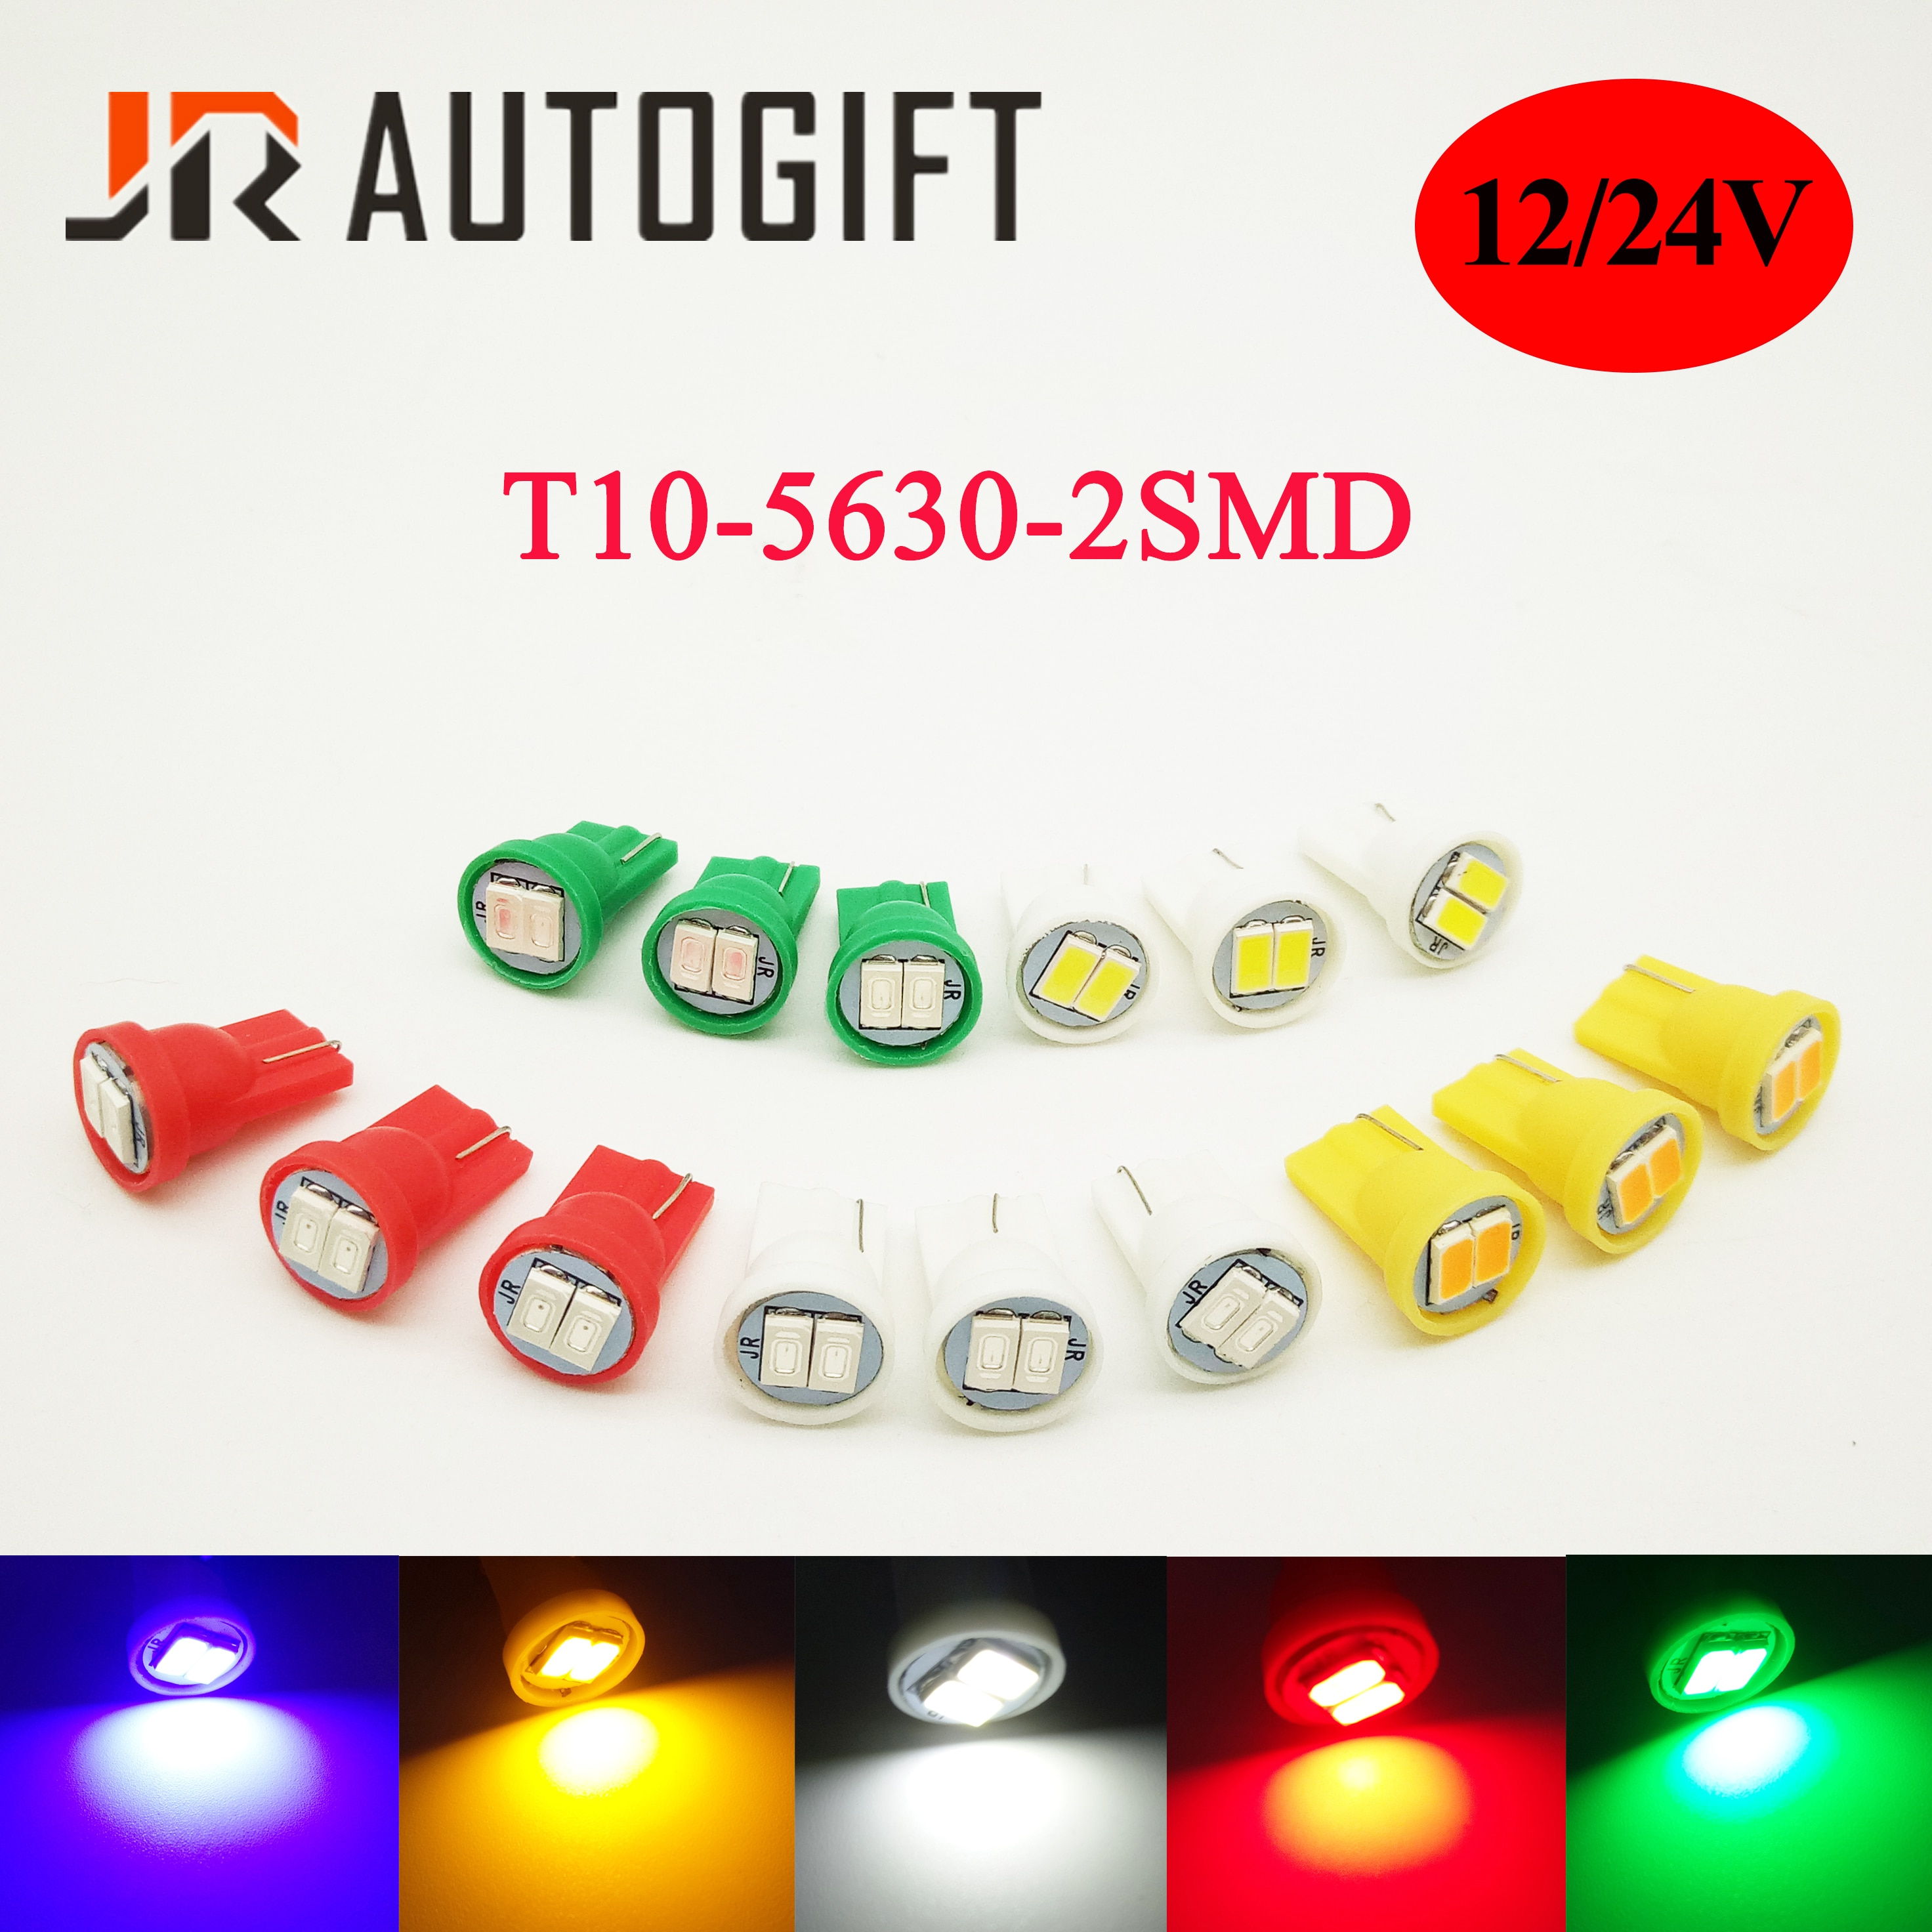 Luces LED de coche T10 194 W5W 2 SMD 5630 de 10 Uds., bombilla LED roja/amarilla/Verde/Azul 12/24V, luces LED laterales para estacionar